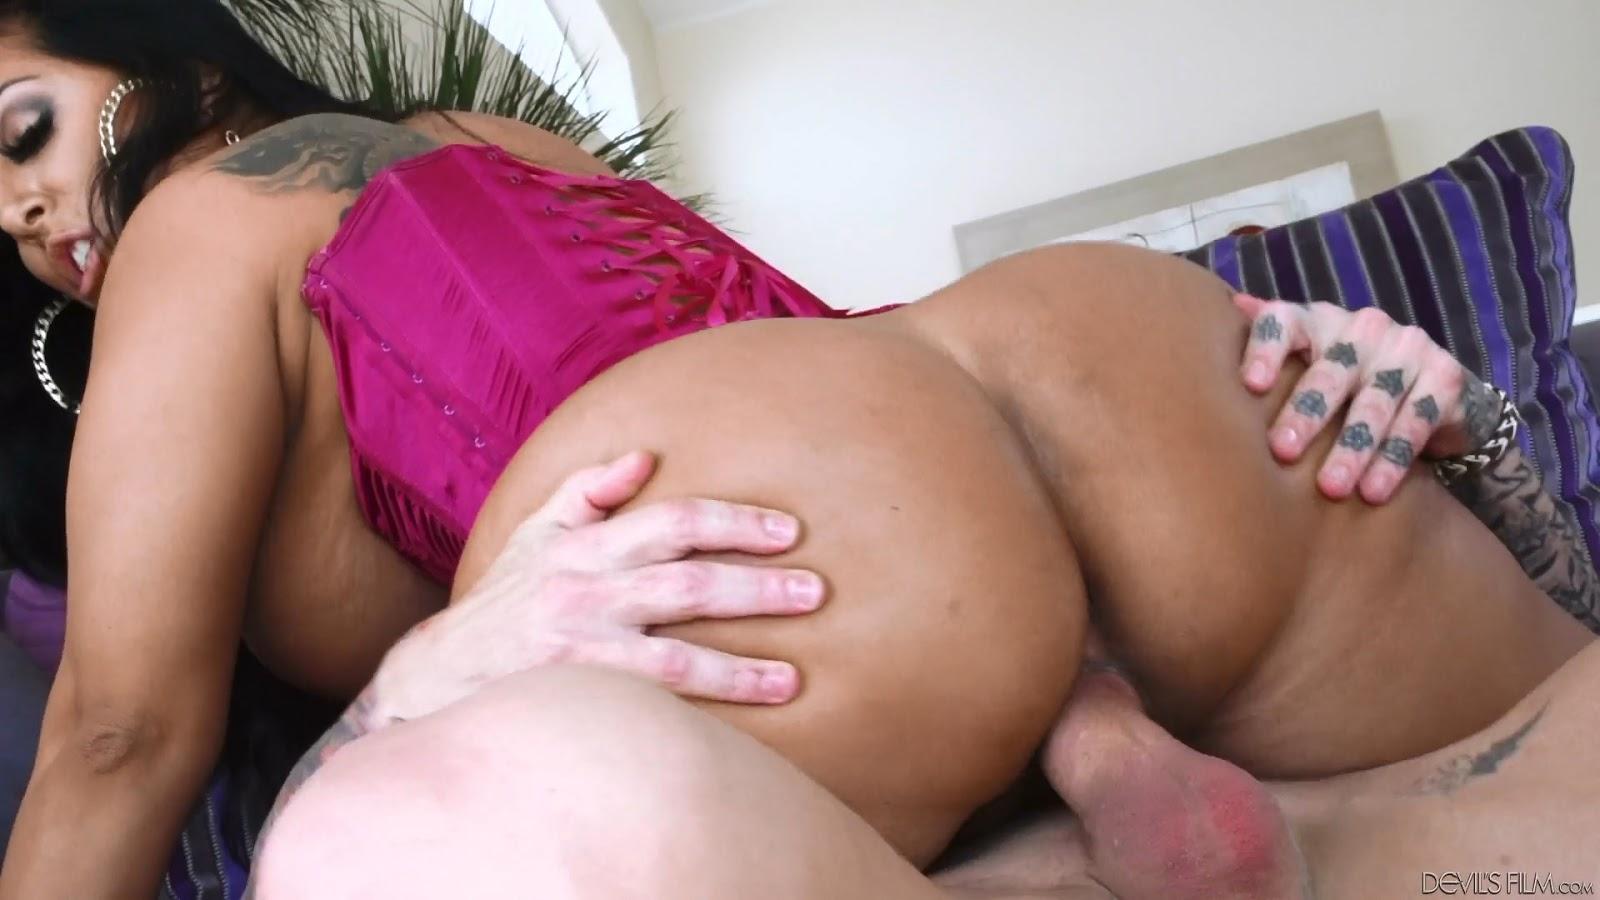 Jamie lynn spears porn sex